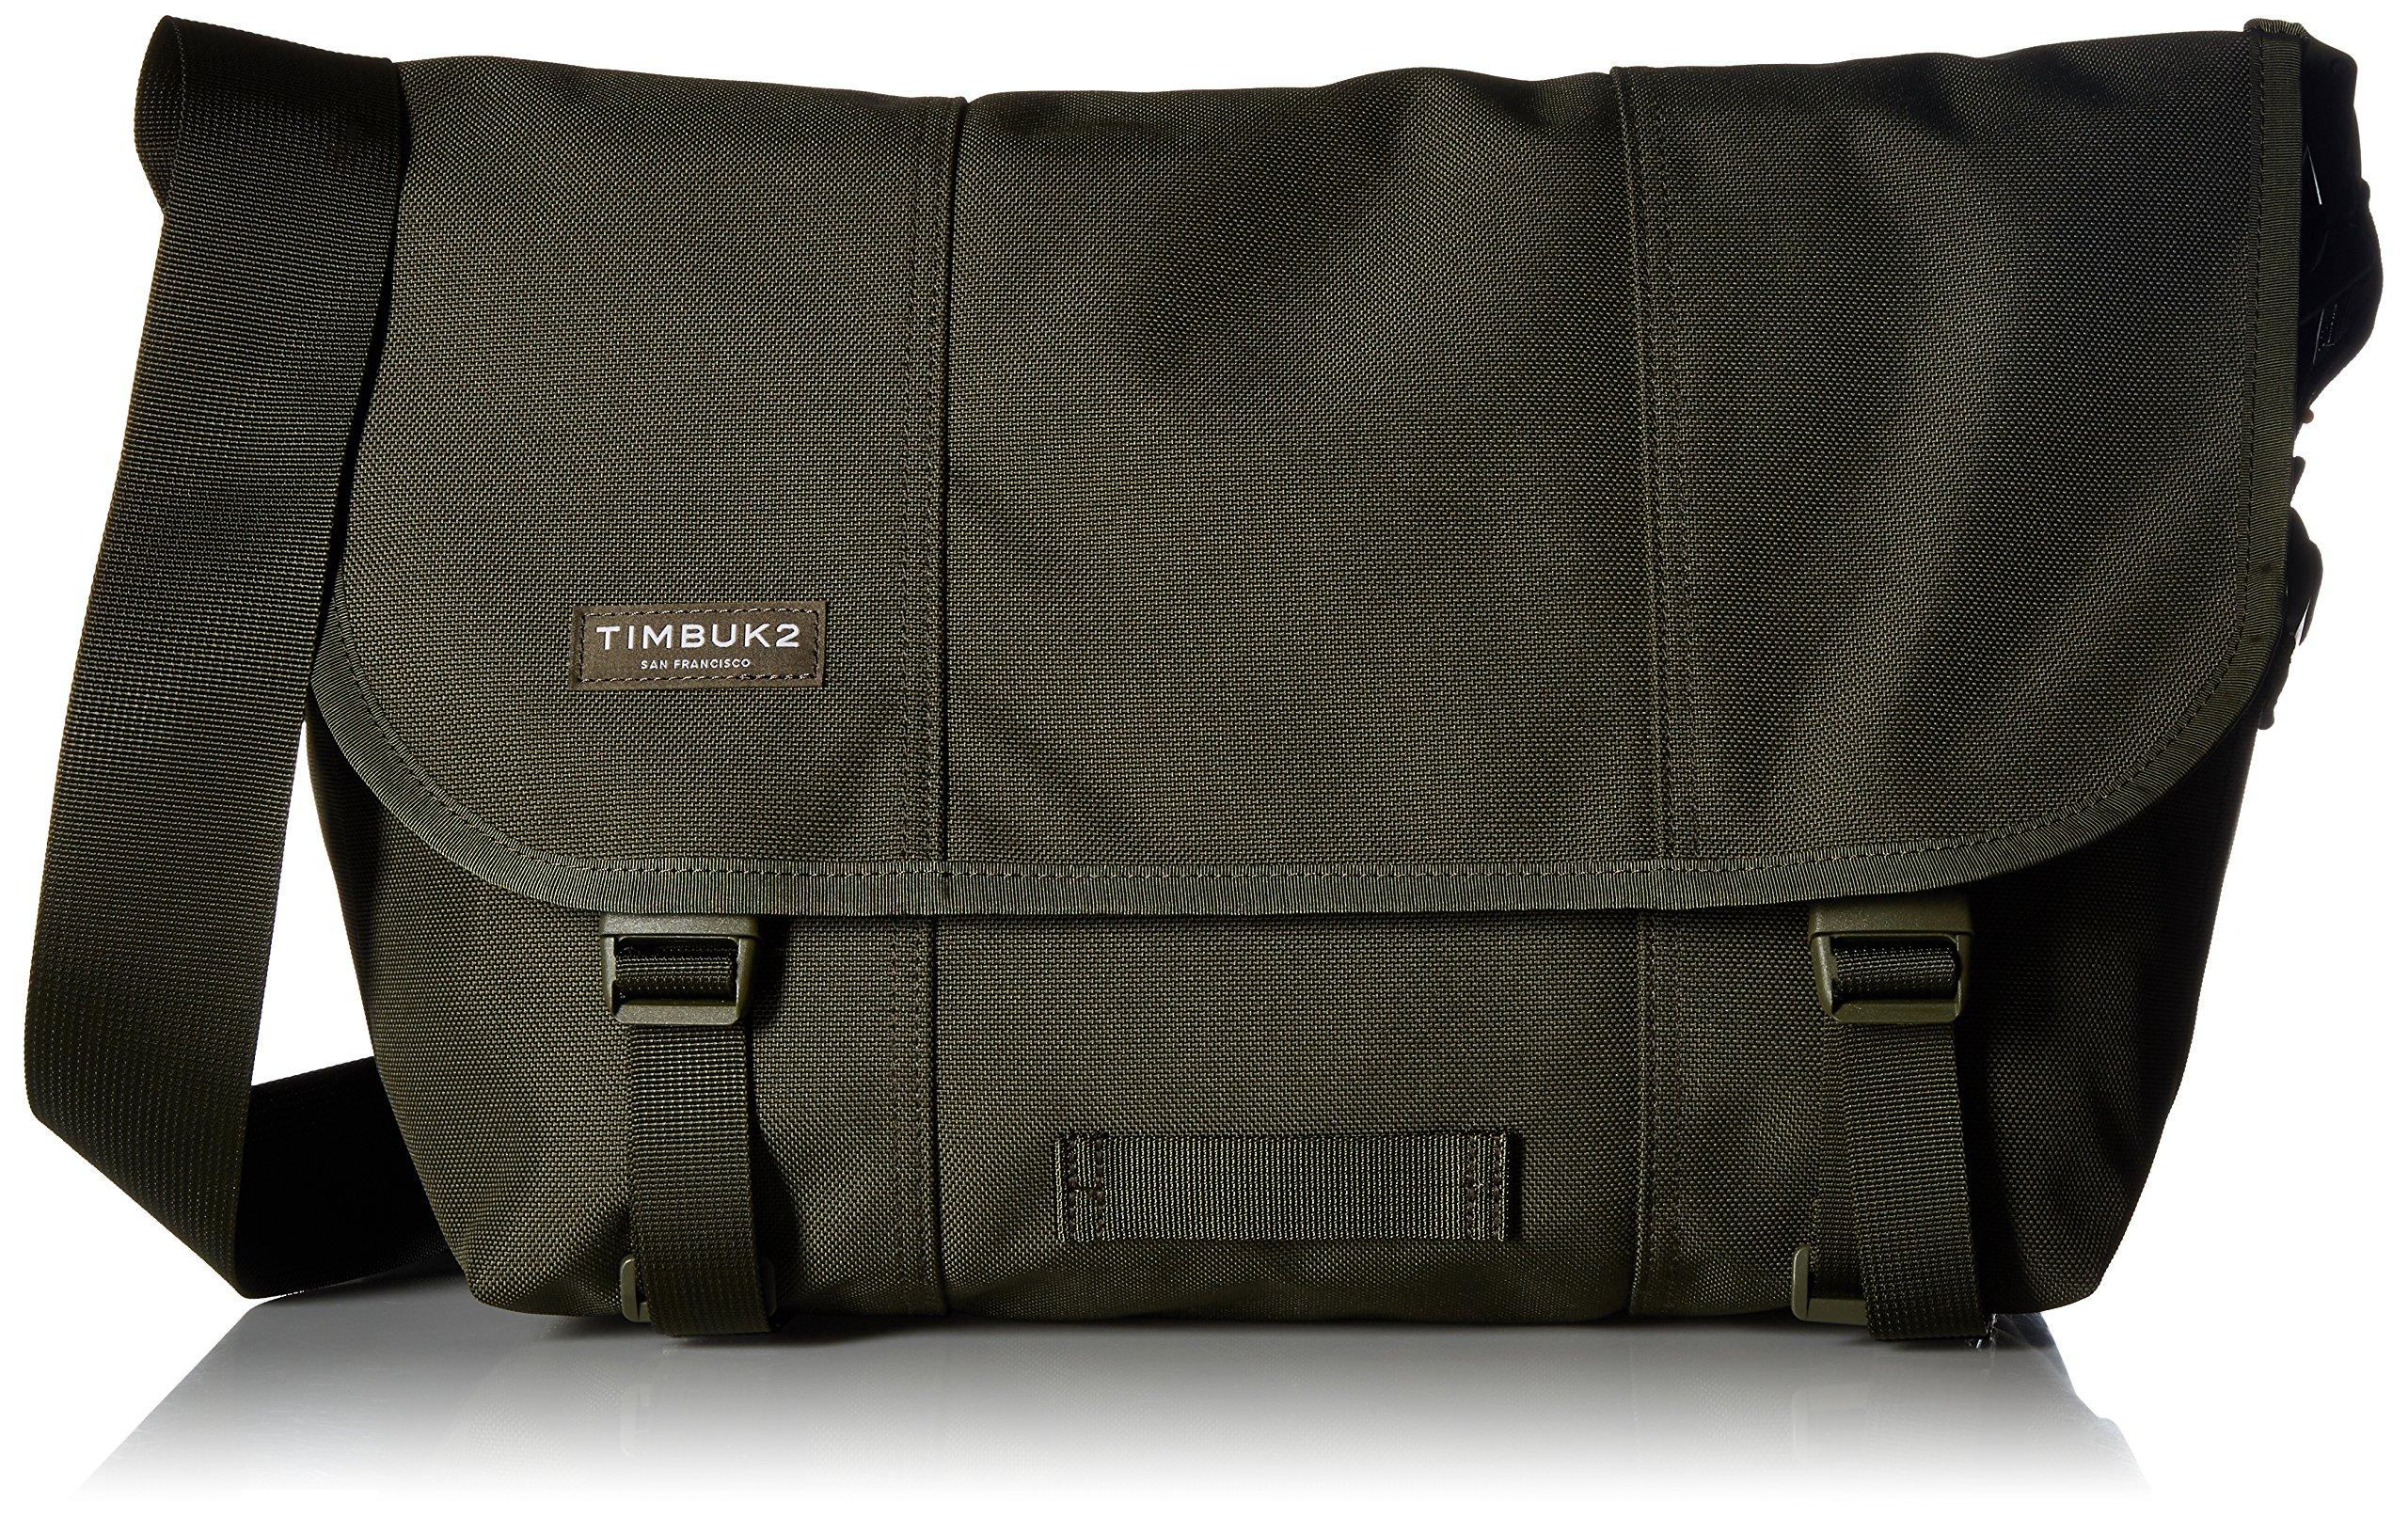 Timbuk2 Classic Messenger Unicolor Bag, Army, Medium